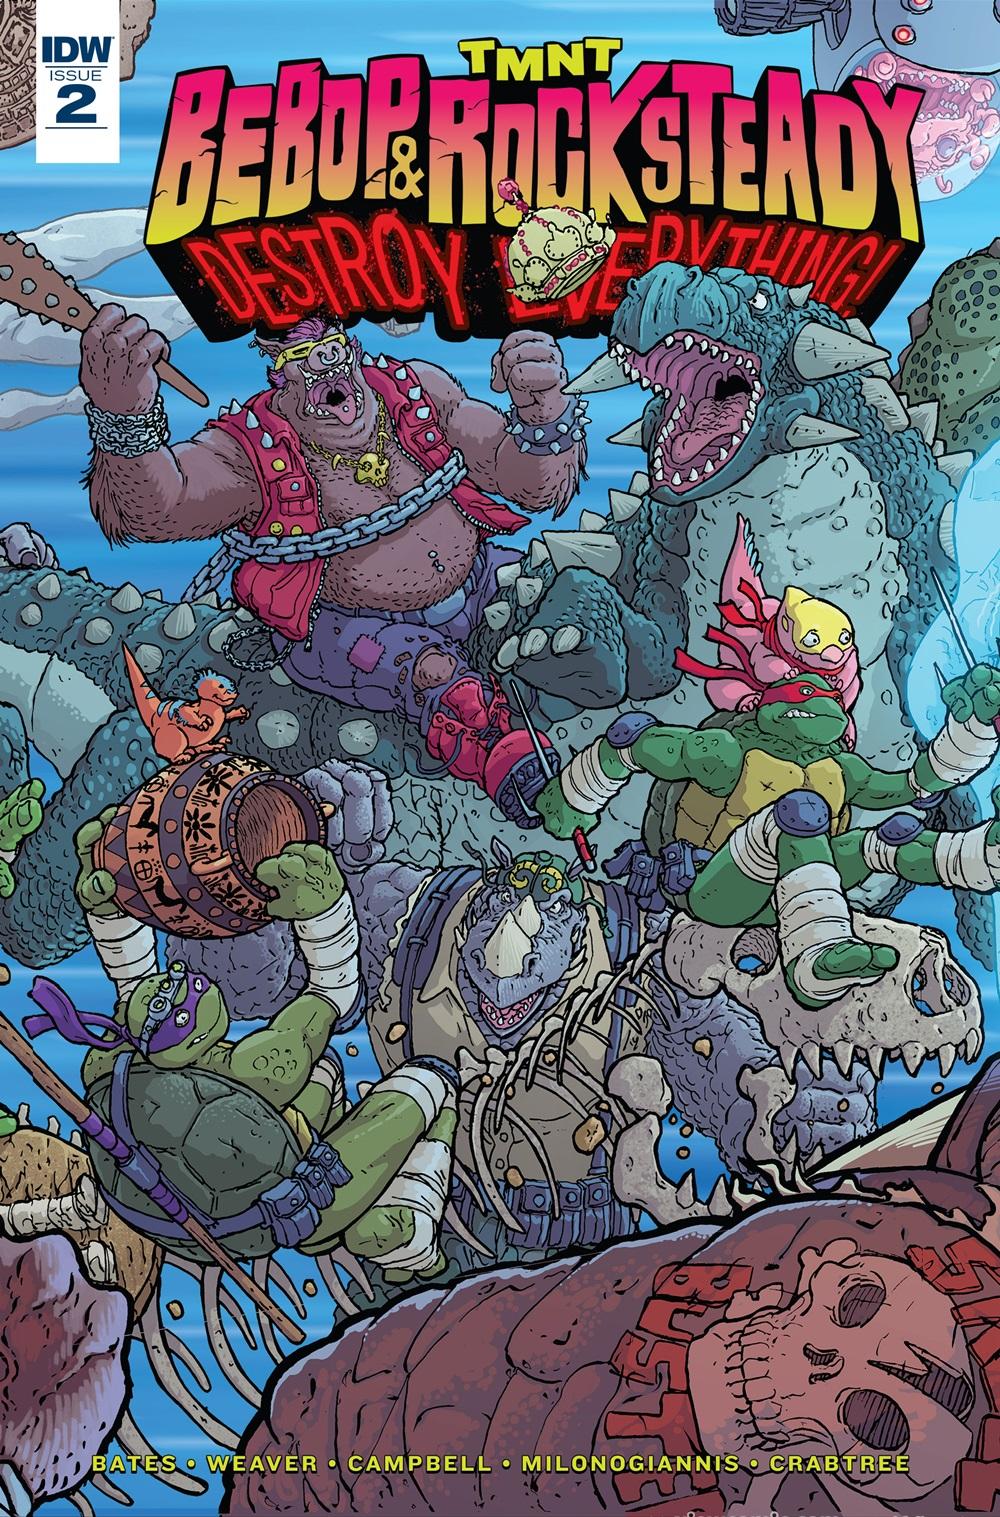 Teenage Mutant Ninja Turtles – Bebop & Rocksteady Destroy Everything